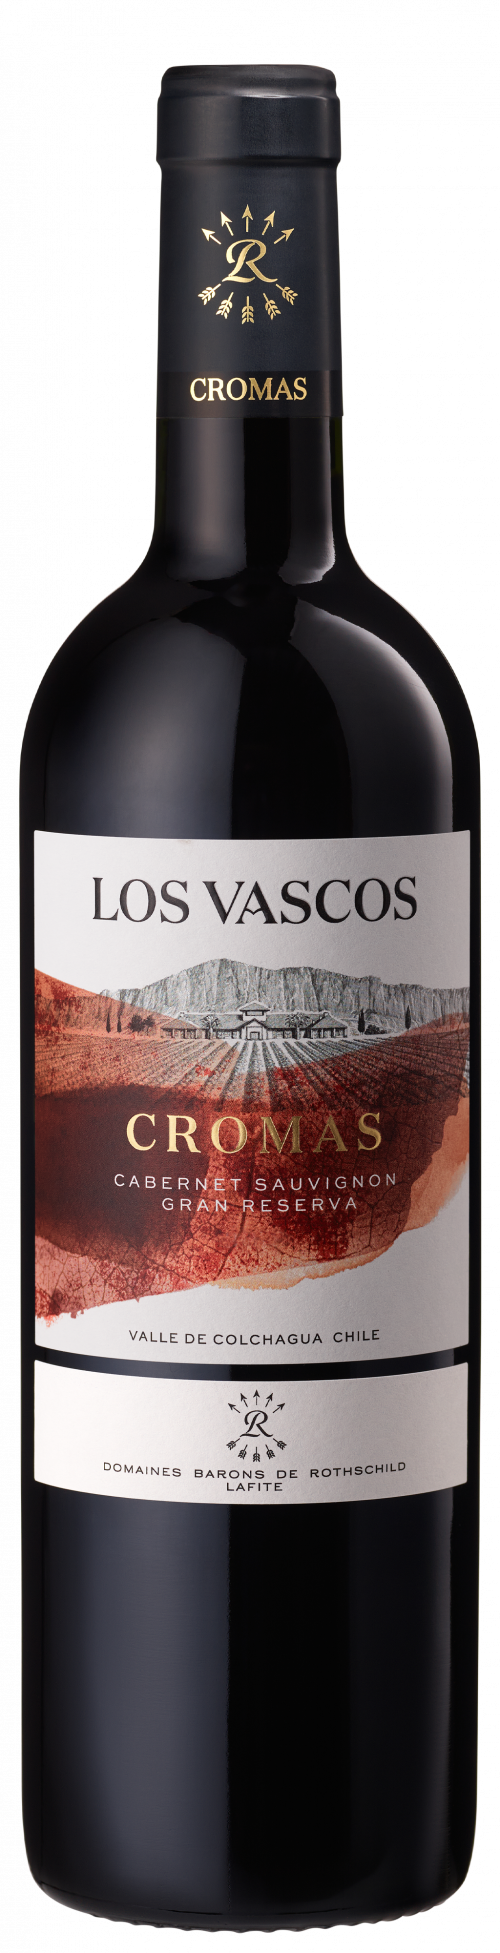 2018 Los Vascos Cromas Grande Reserve Cabernet Sauvignon 750ml